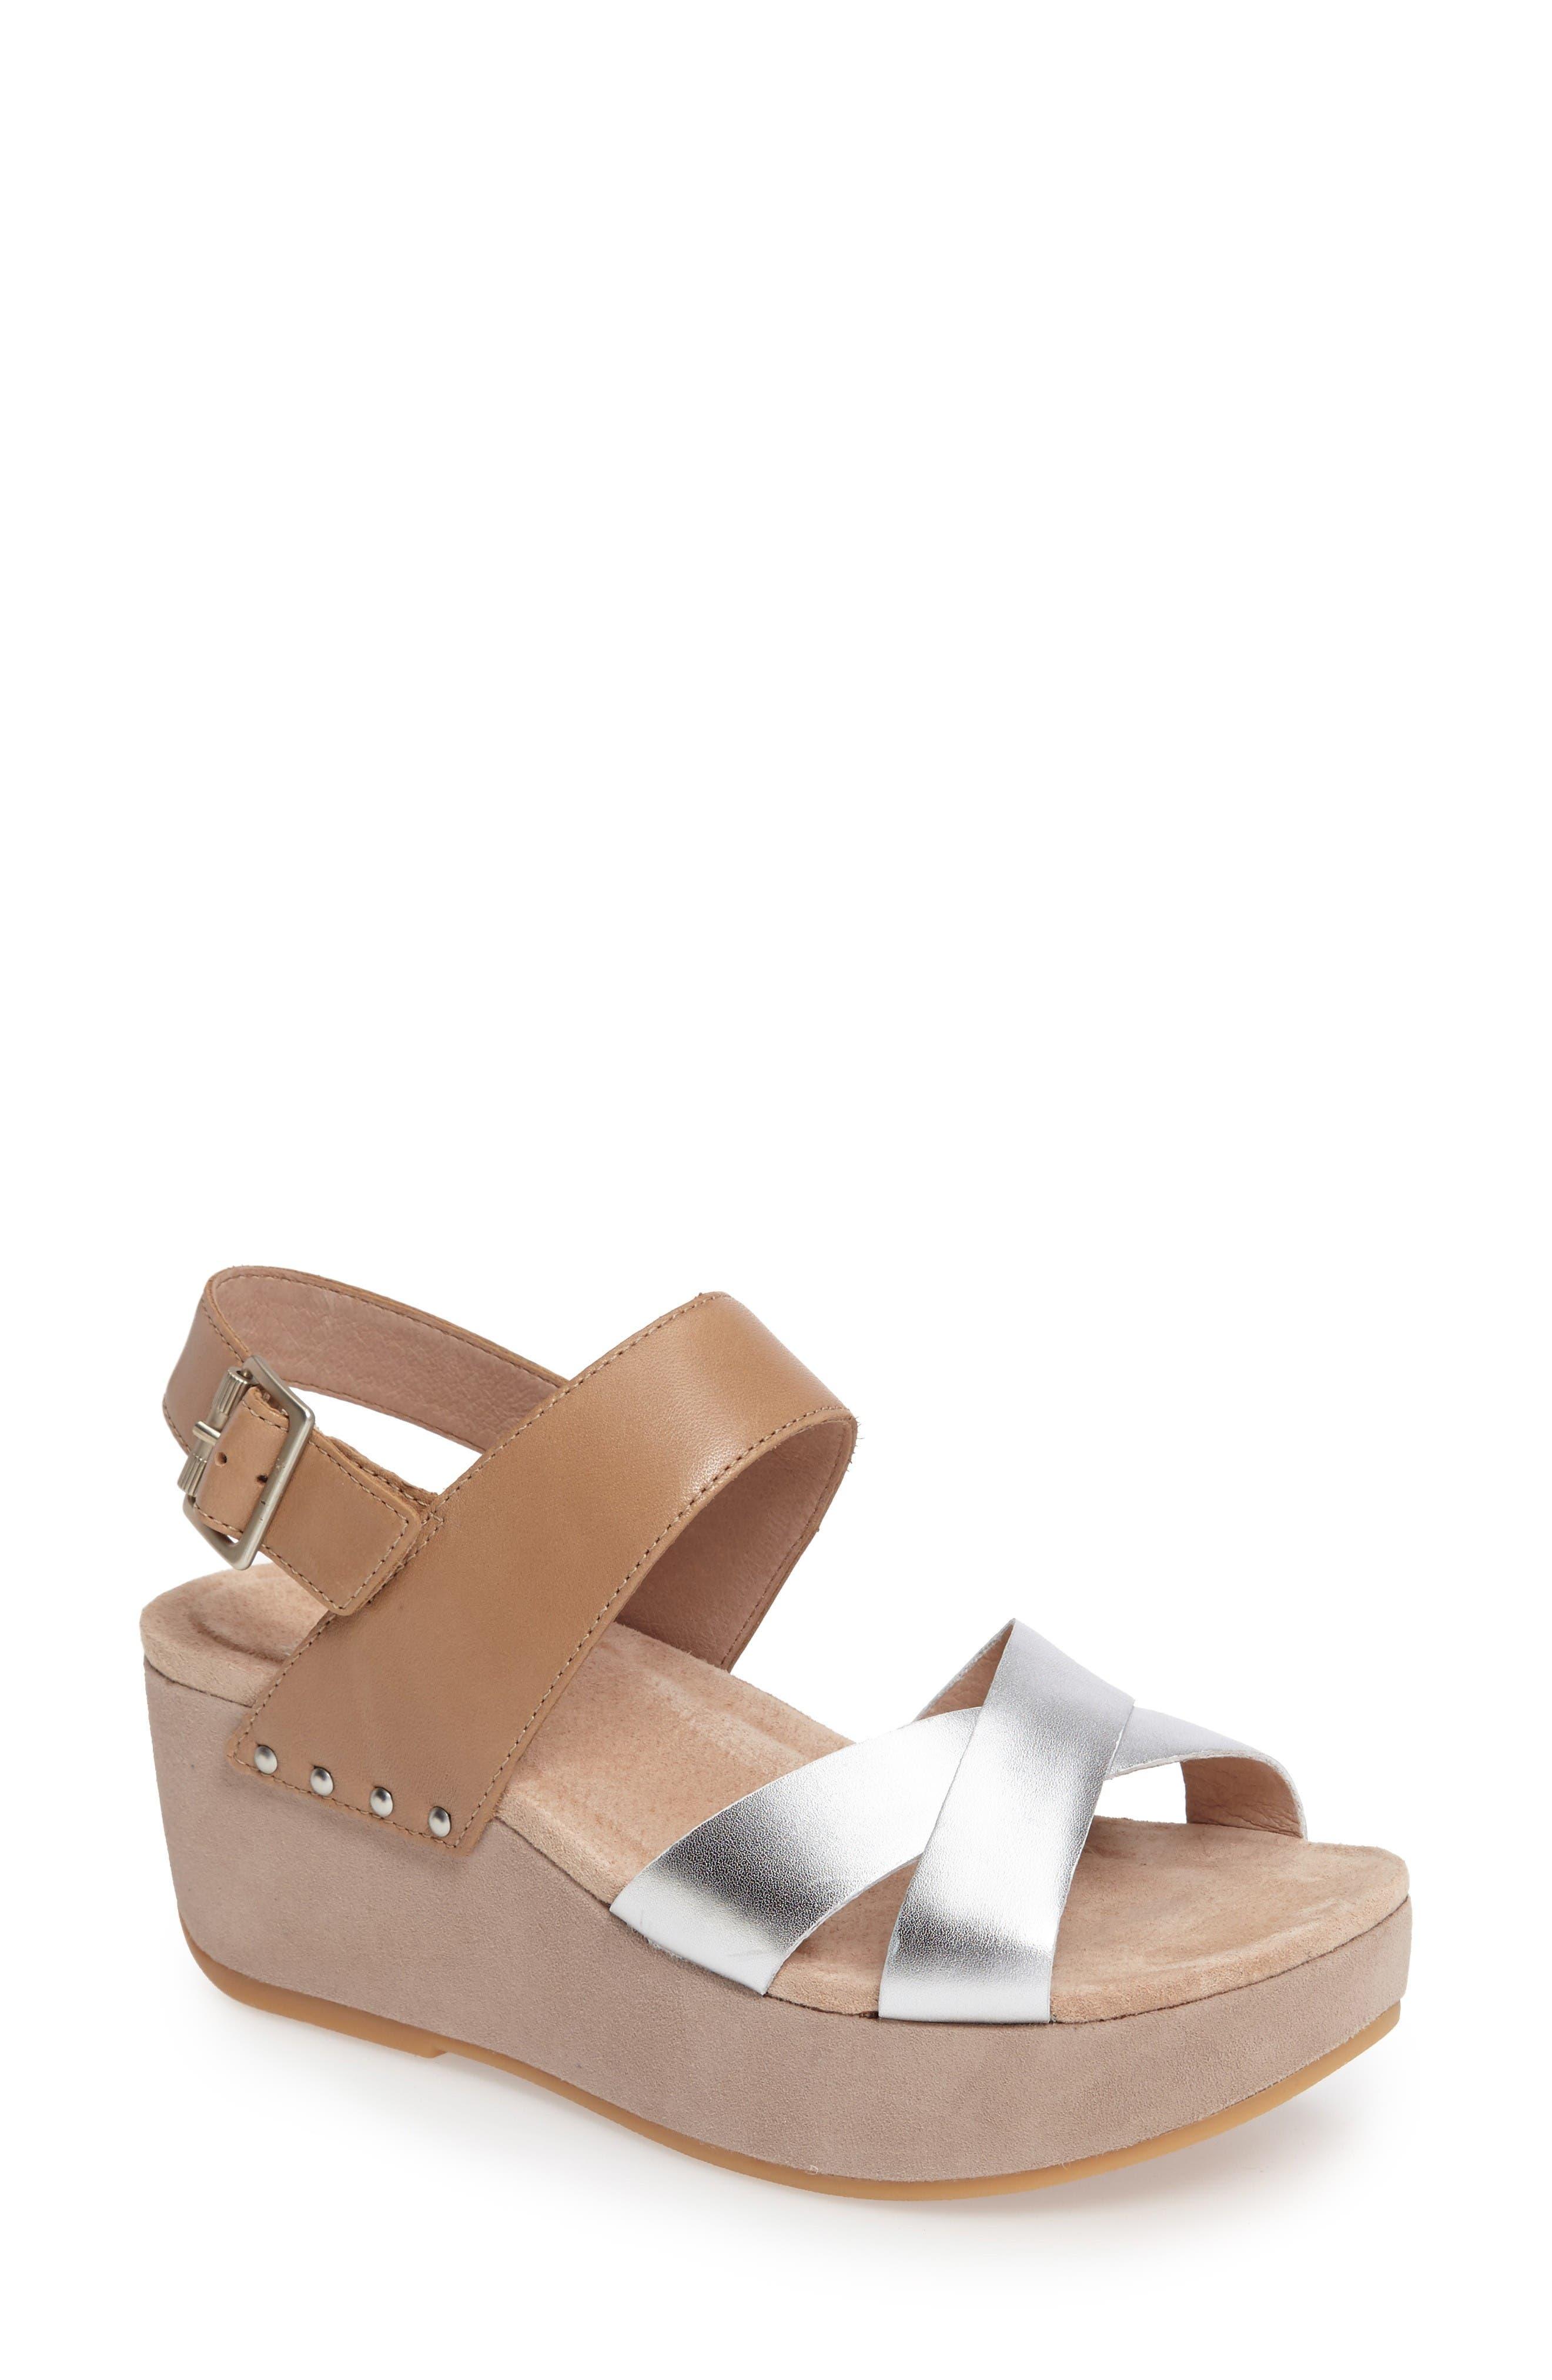 Stasia Platform Wedge Sandal,                         Main,                         color, Sand/ Silver Leather